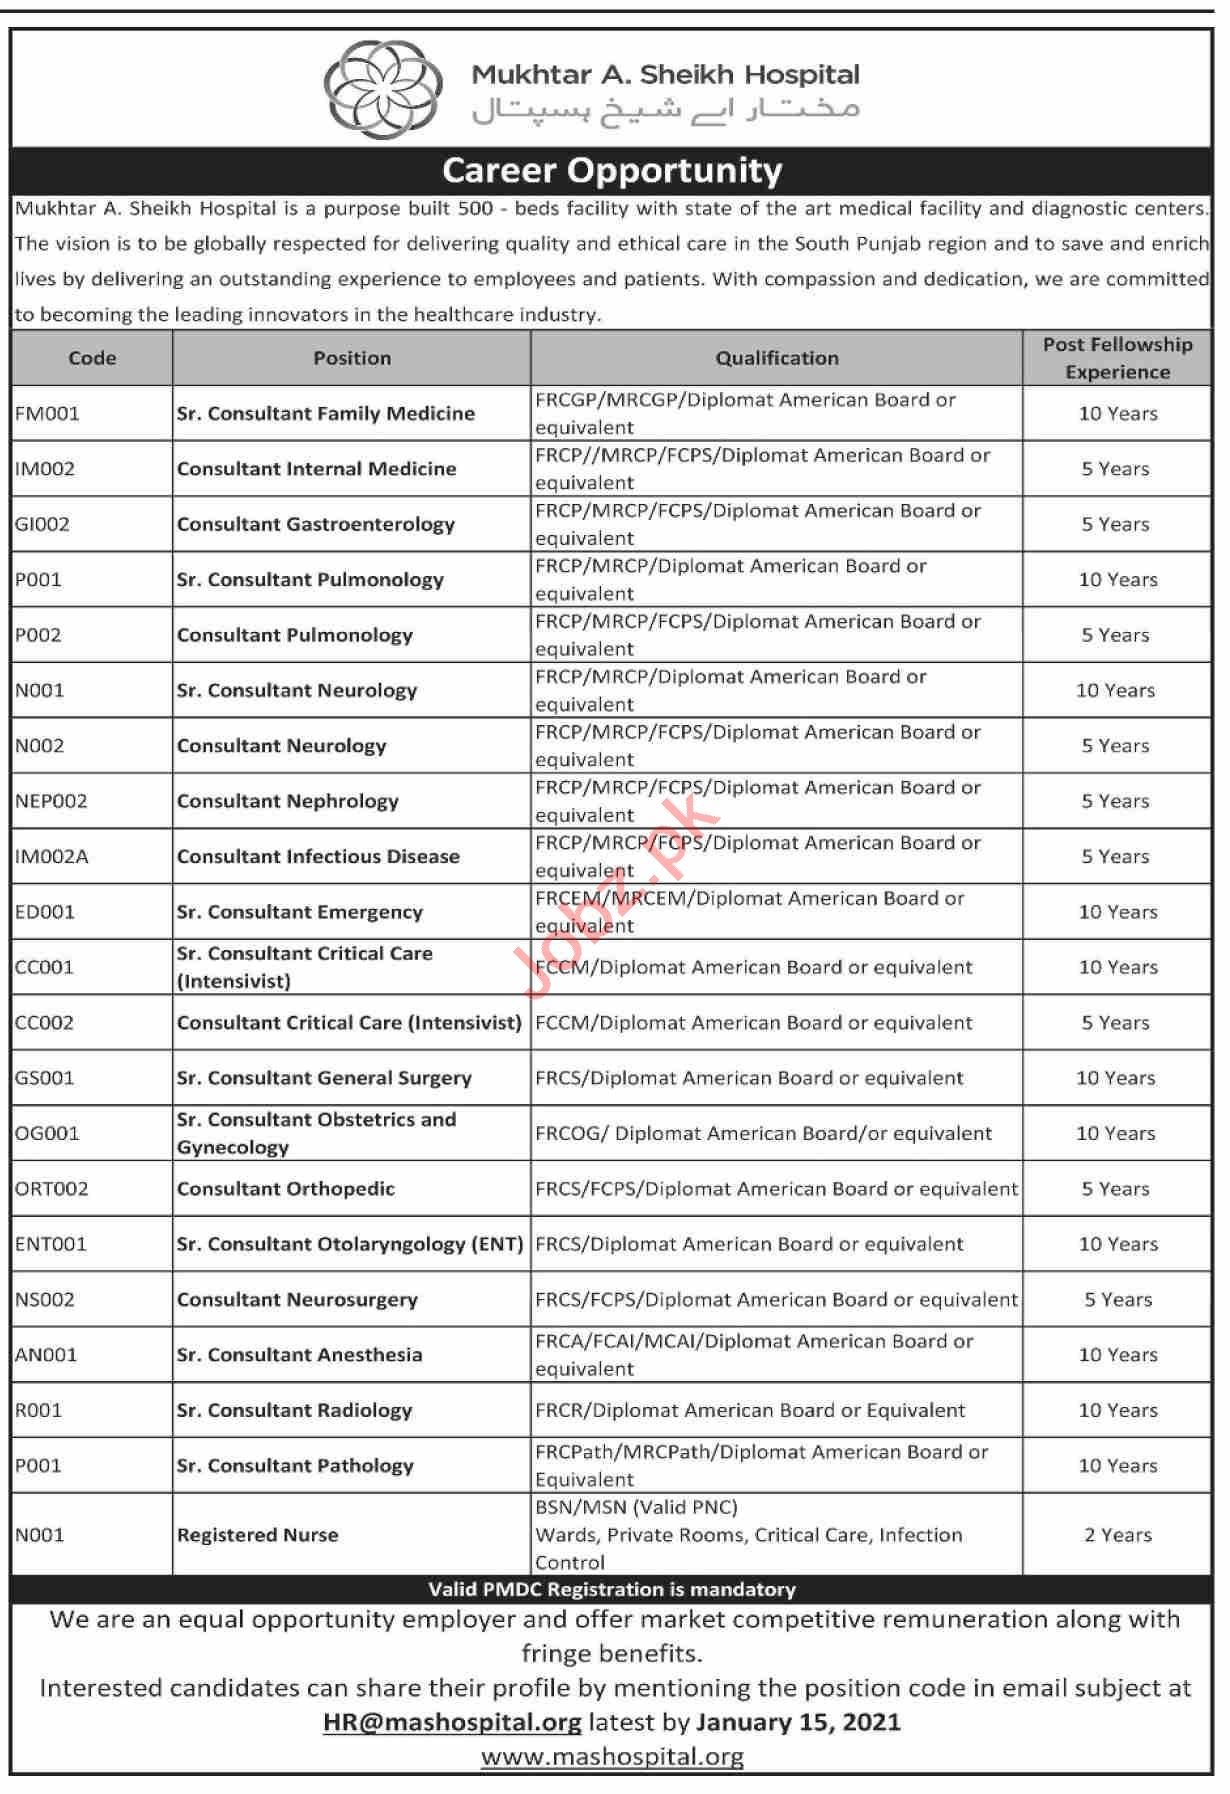 Mukhtar A Sheikh Hospital Jobs 2021 for Medical Consultant